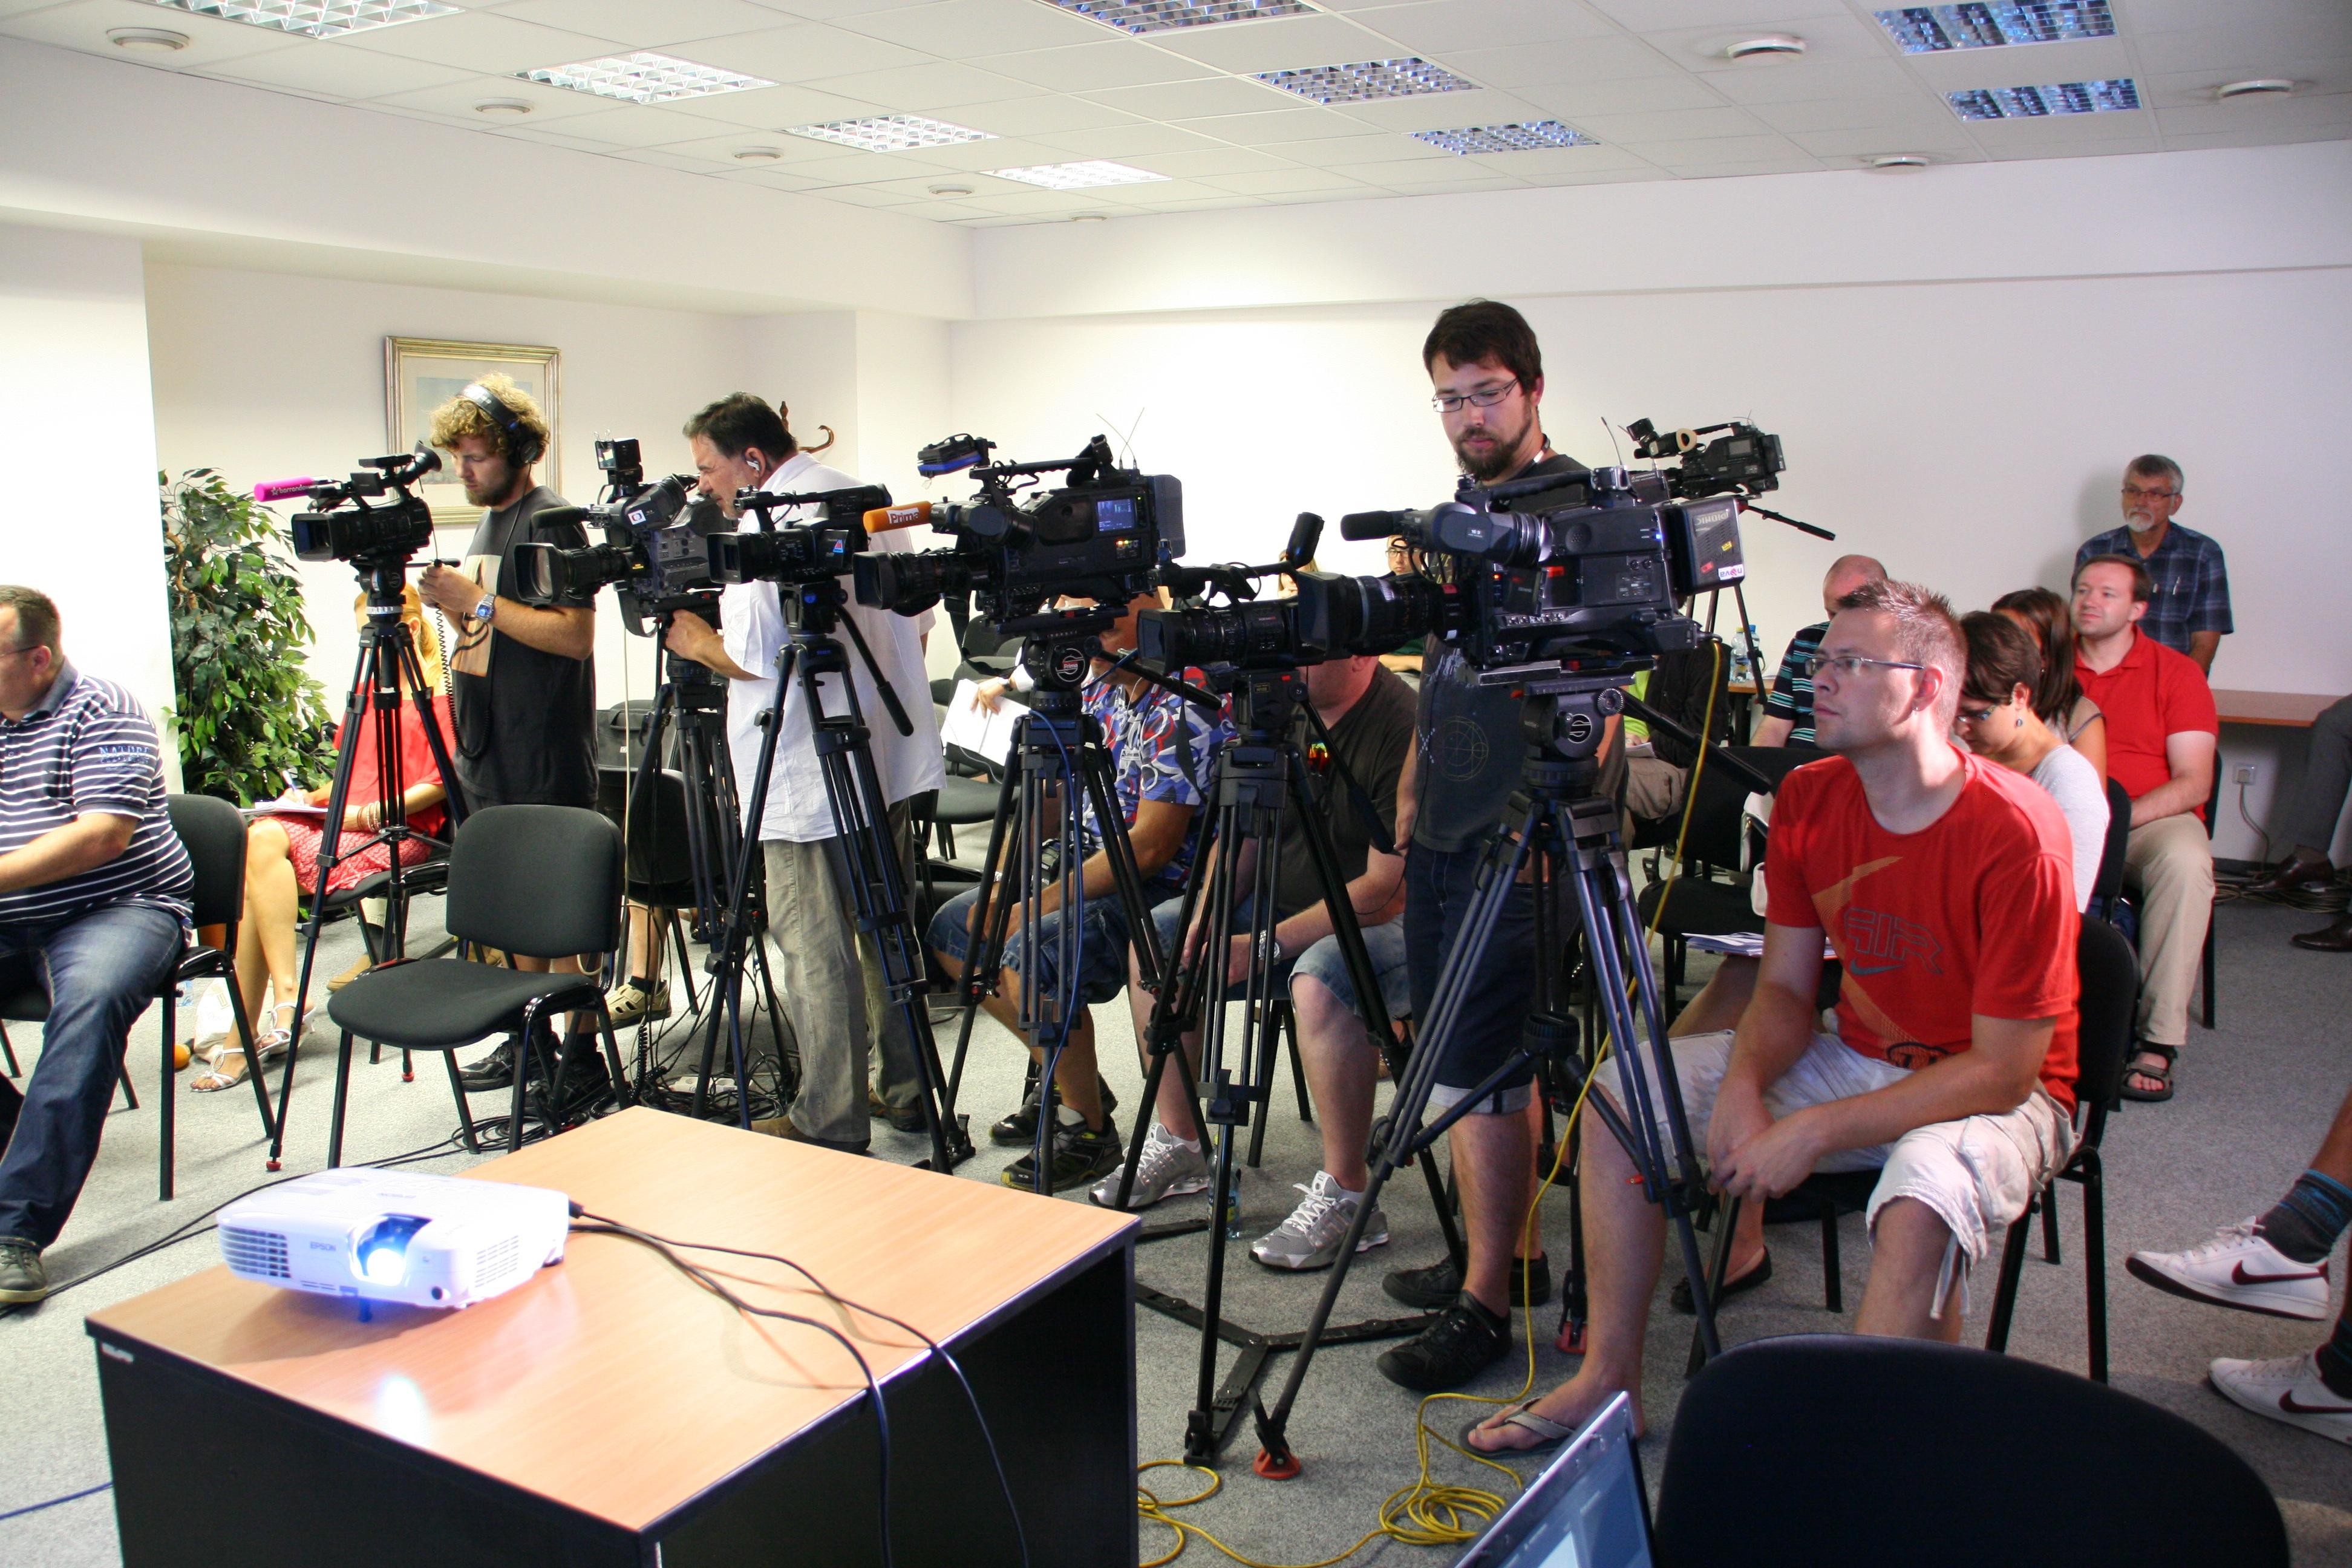 Press Conferences - image press-conference-1166343 on https://4kfreelance.com